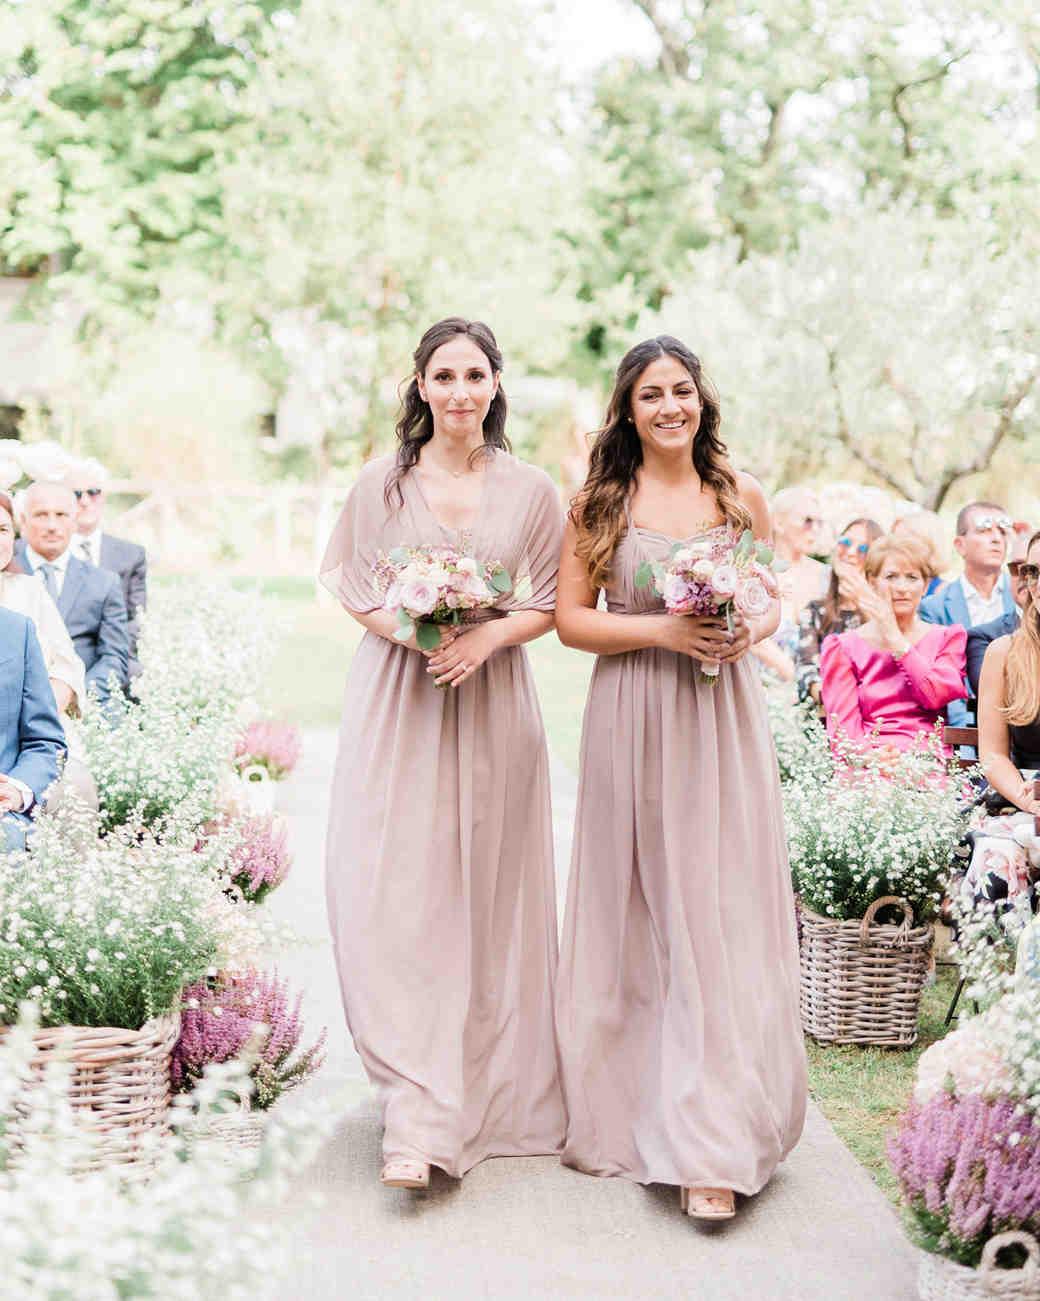 two bridesmaids walking down wedding aisle wearing mauve dresses